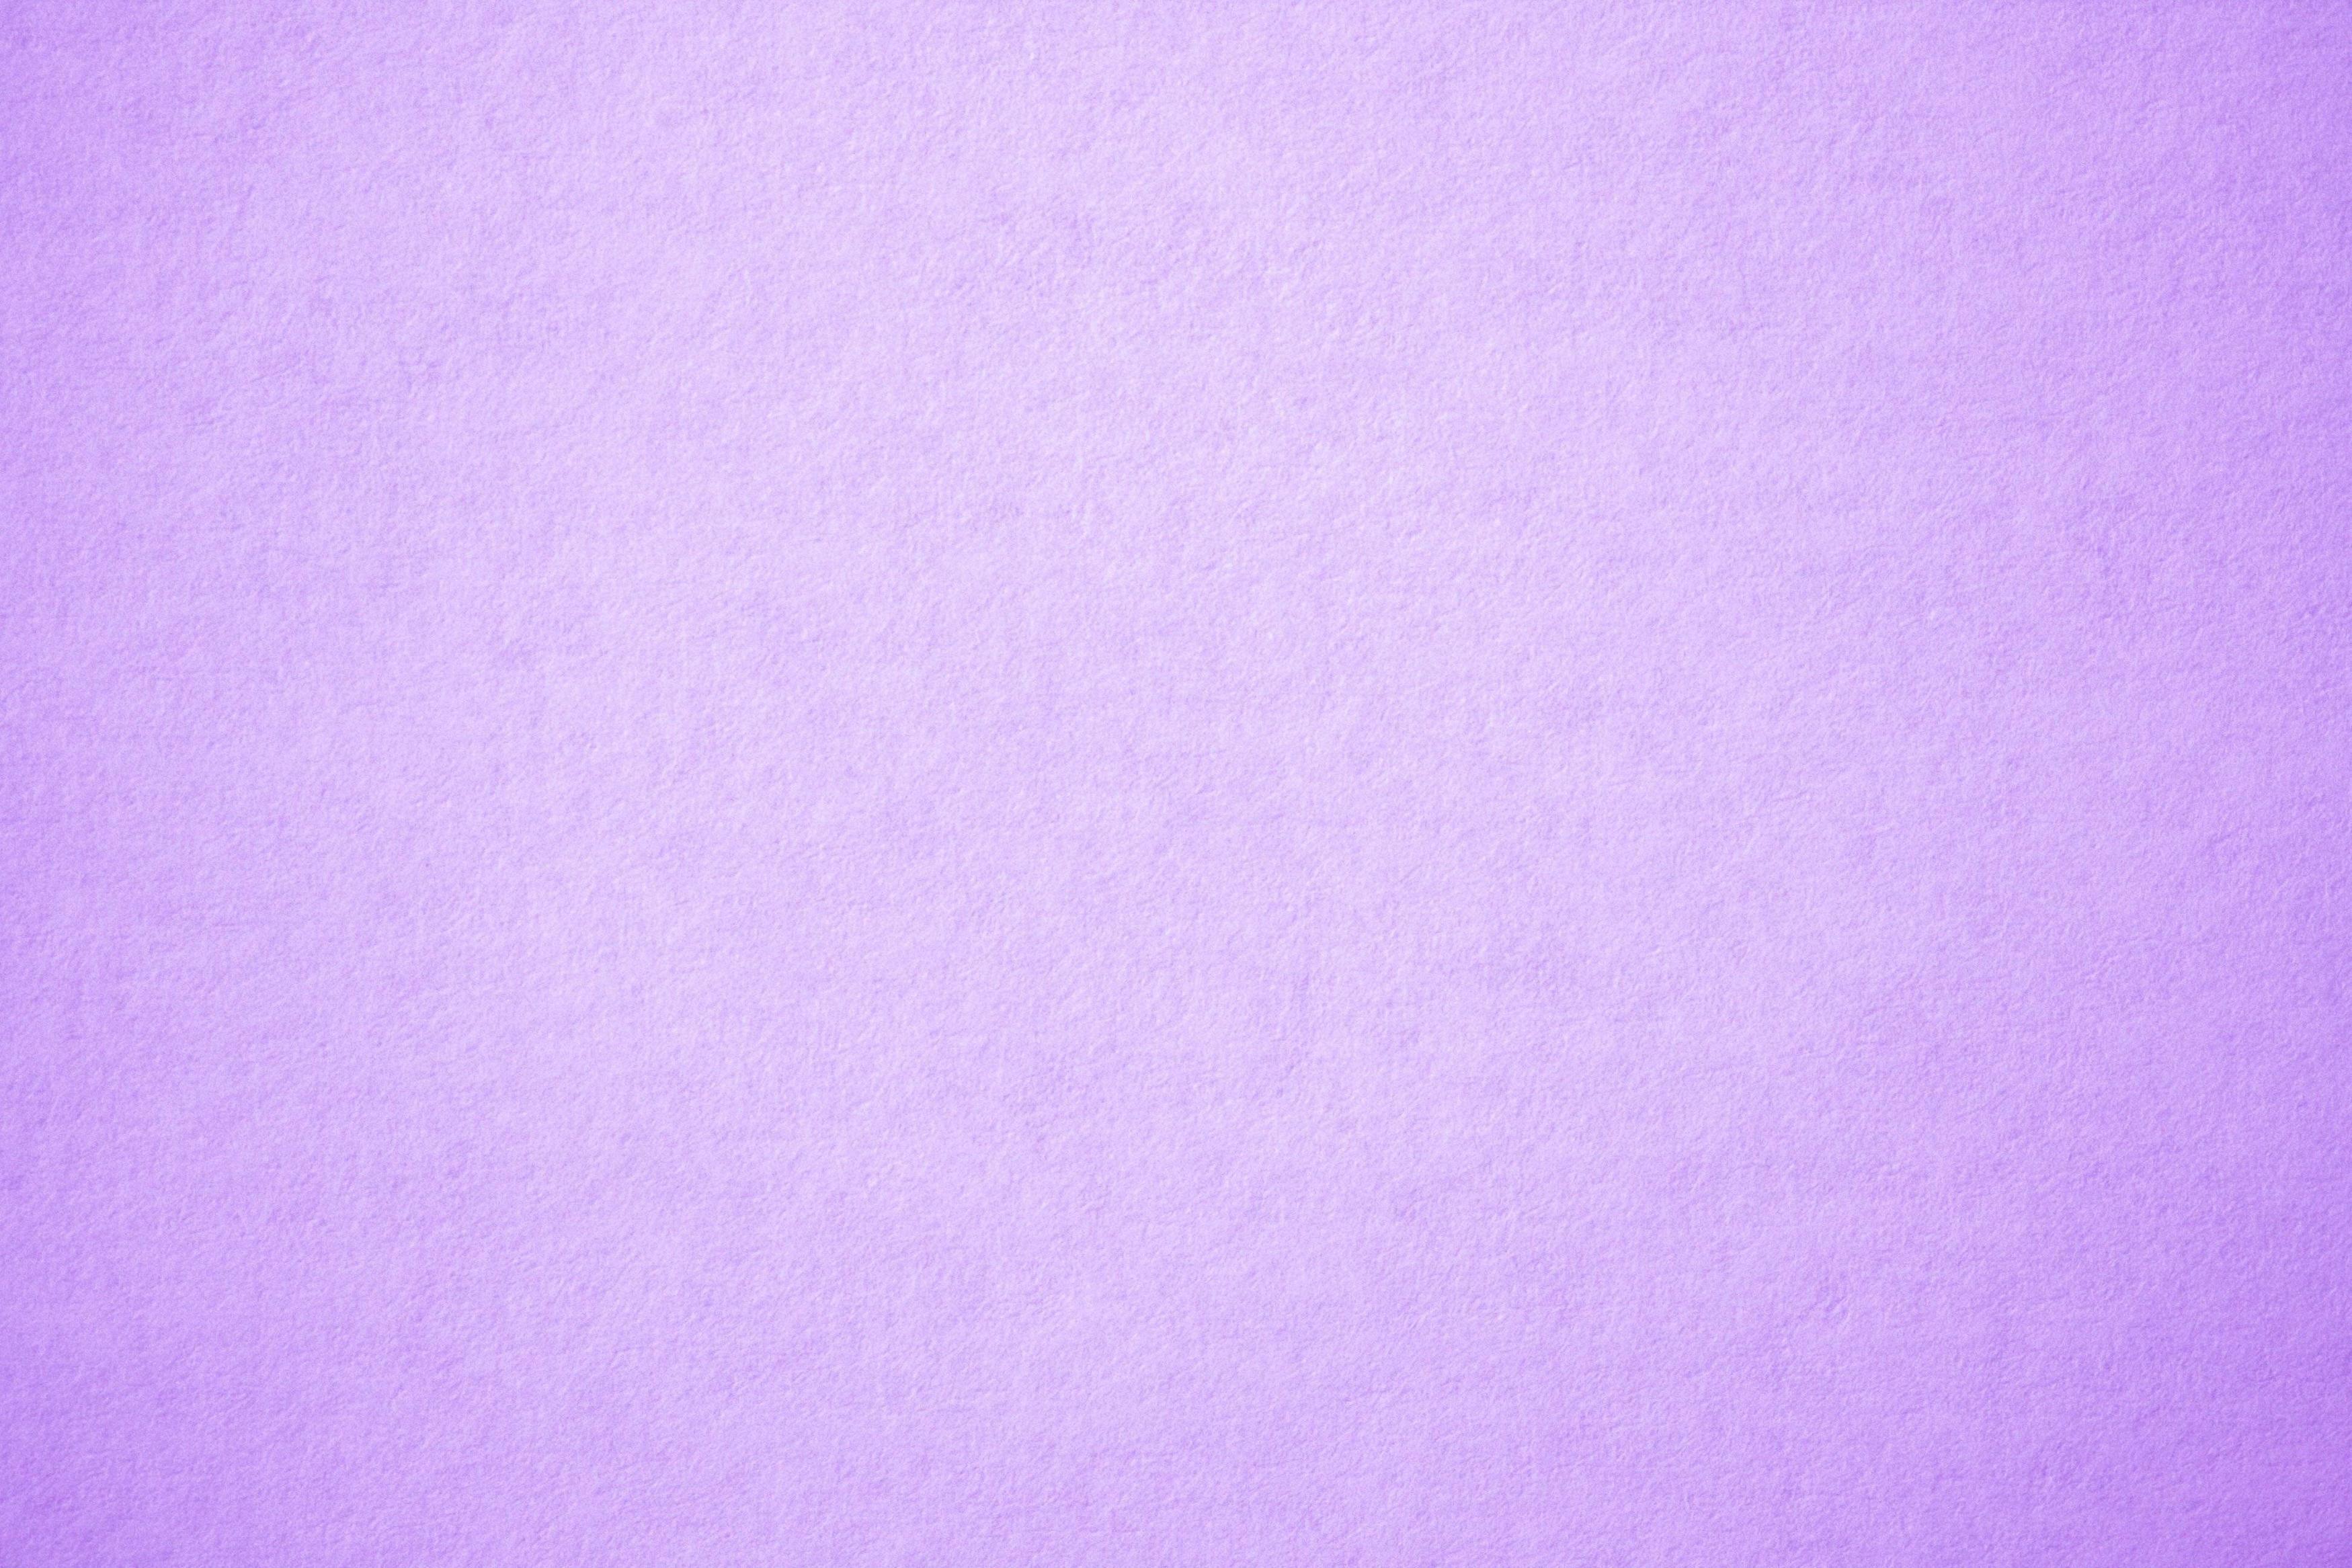 Pastel Light Purple Tosmun